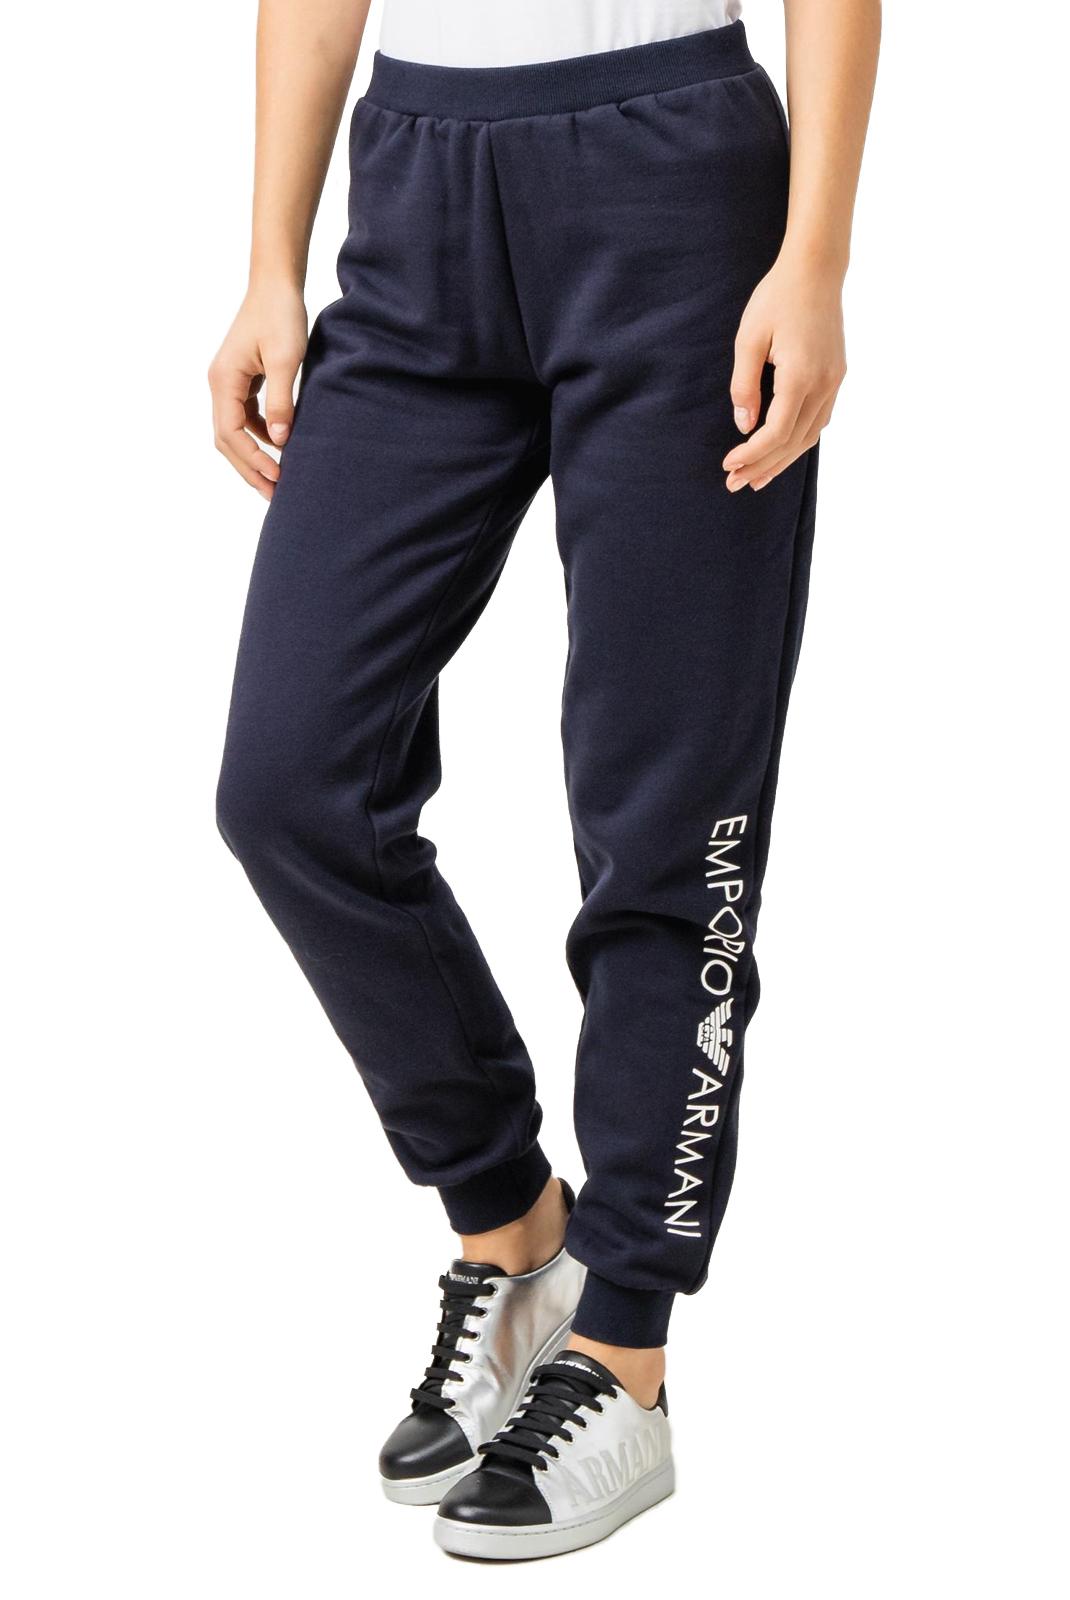 Pantalons  Emporio armani 163774 9A250 00135 BLEU